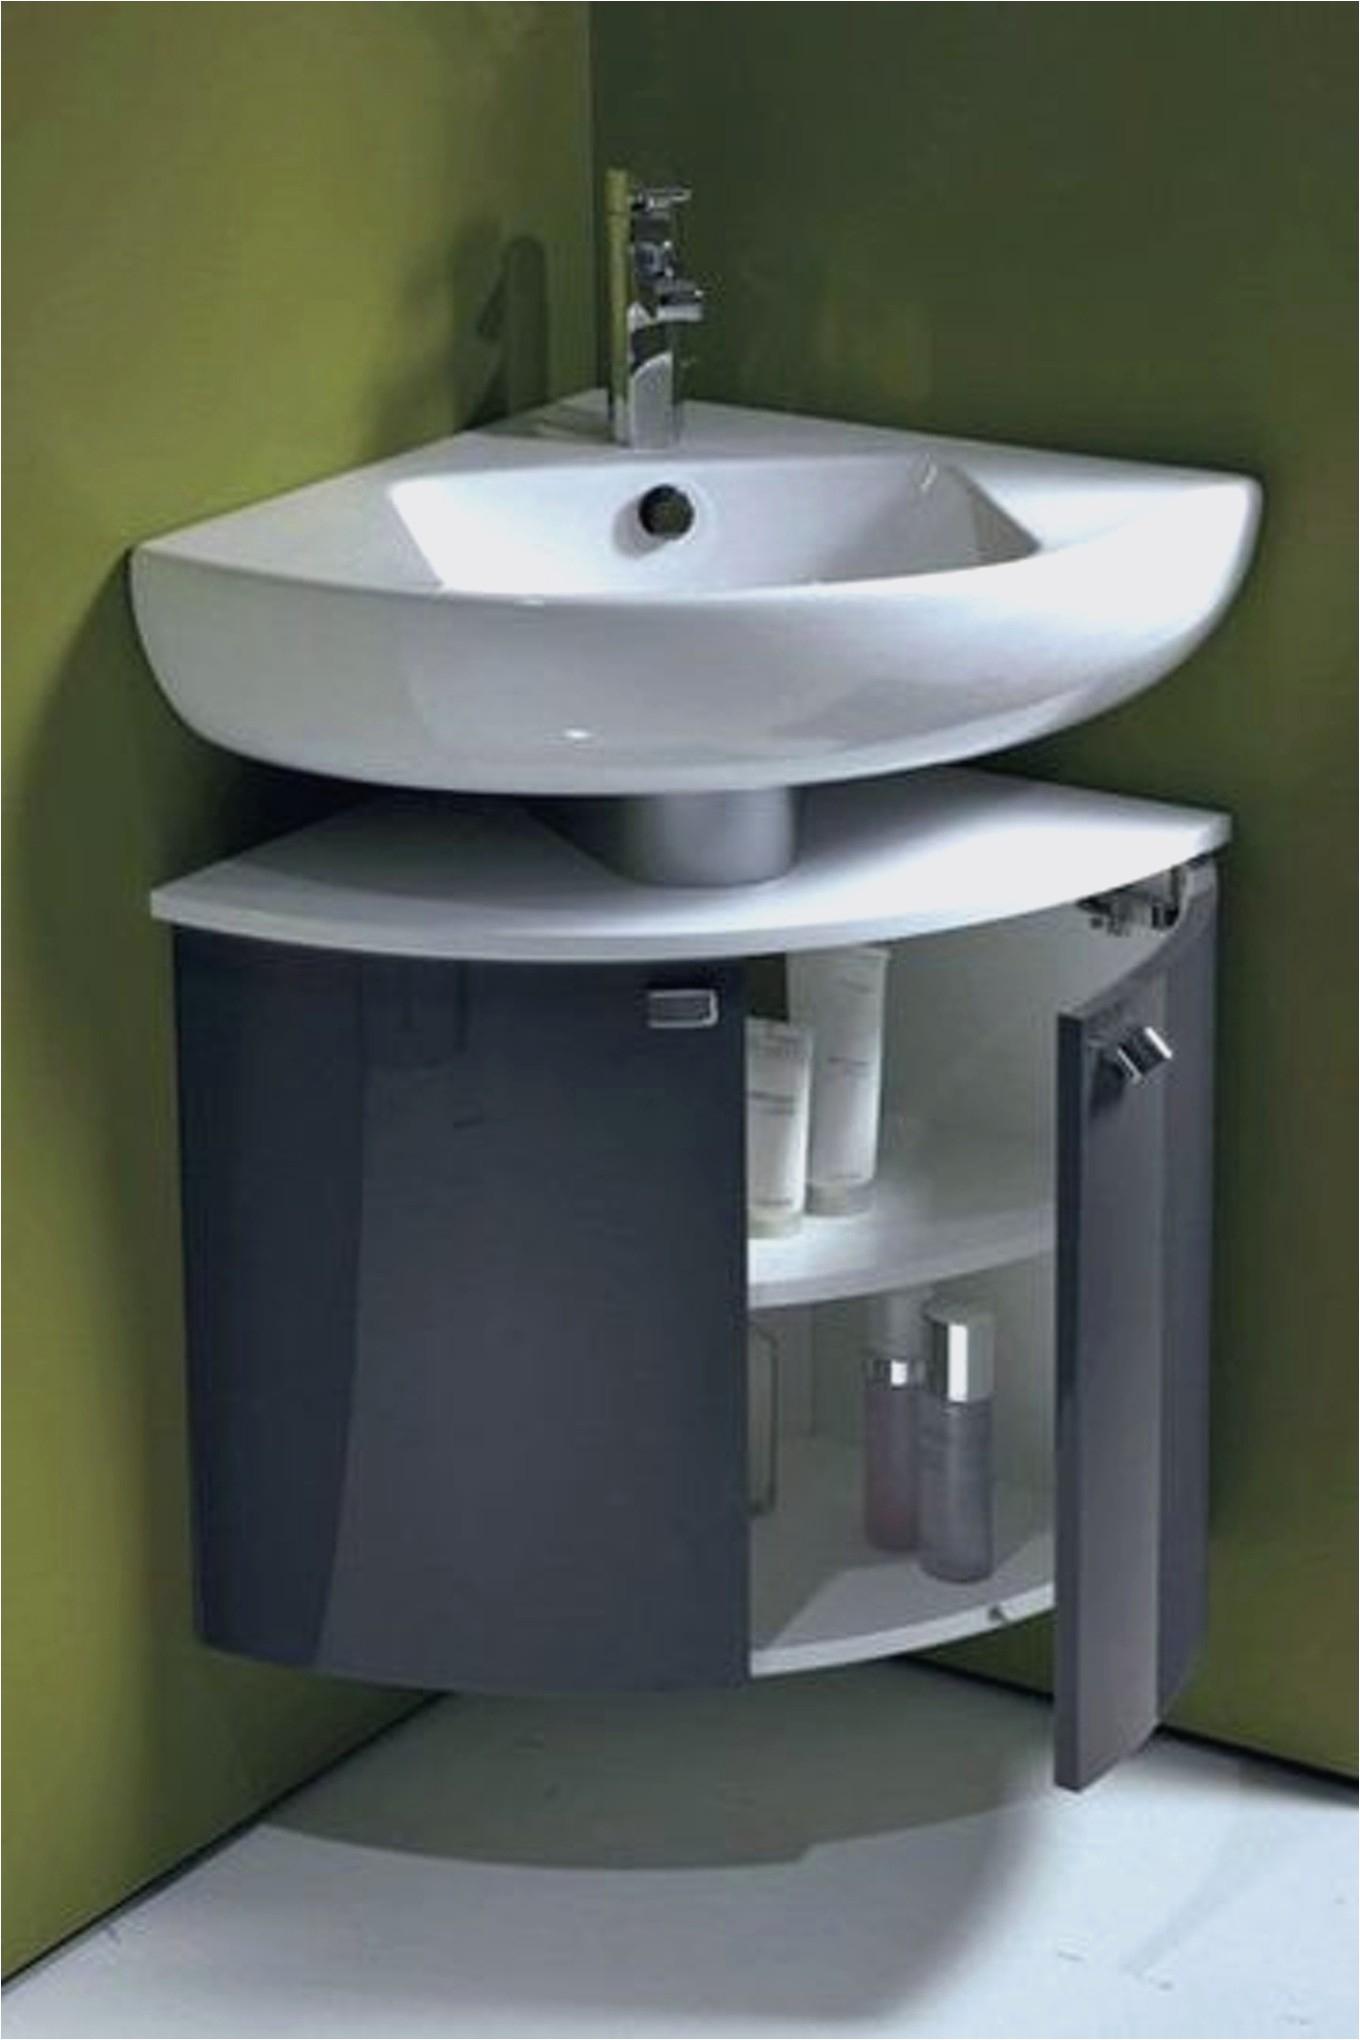 Evier Salle De Bain Ikea Inspirant Photographie Meuble Lavabo D Angle Salle De Bain Lave Main Ikea Frais Meuble